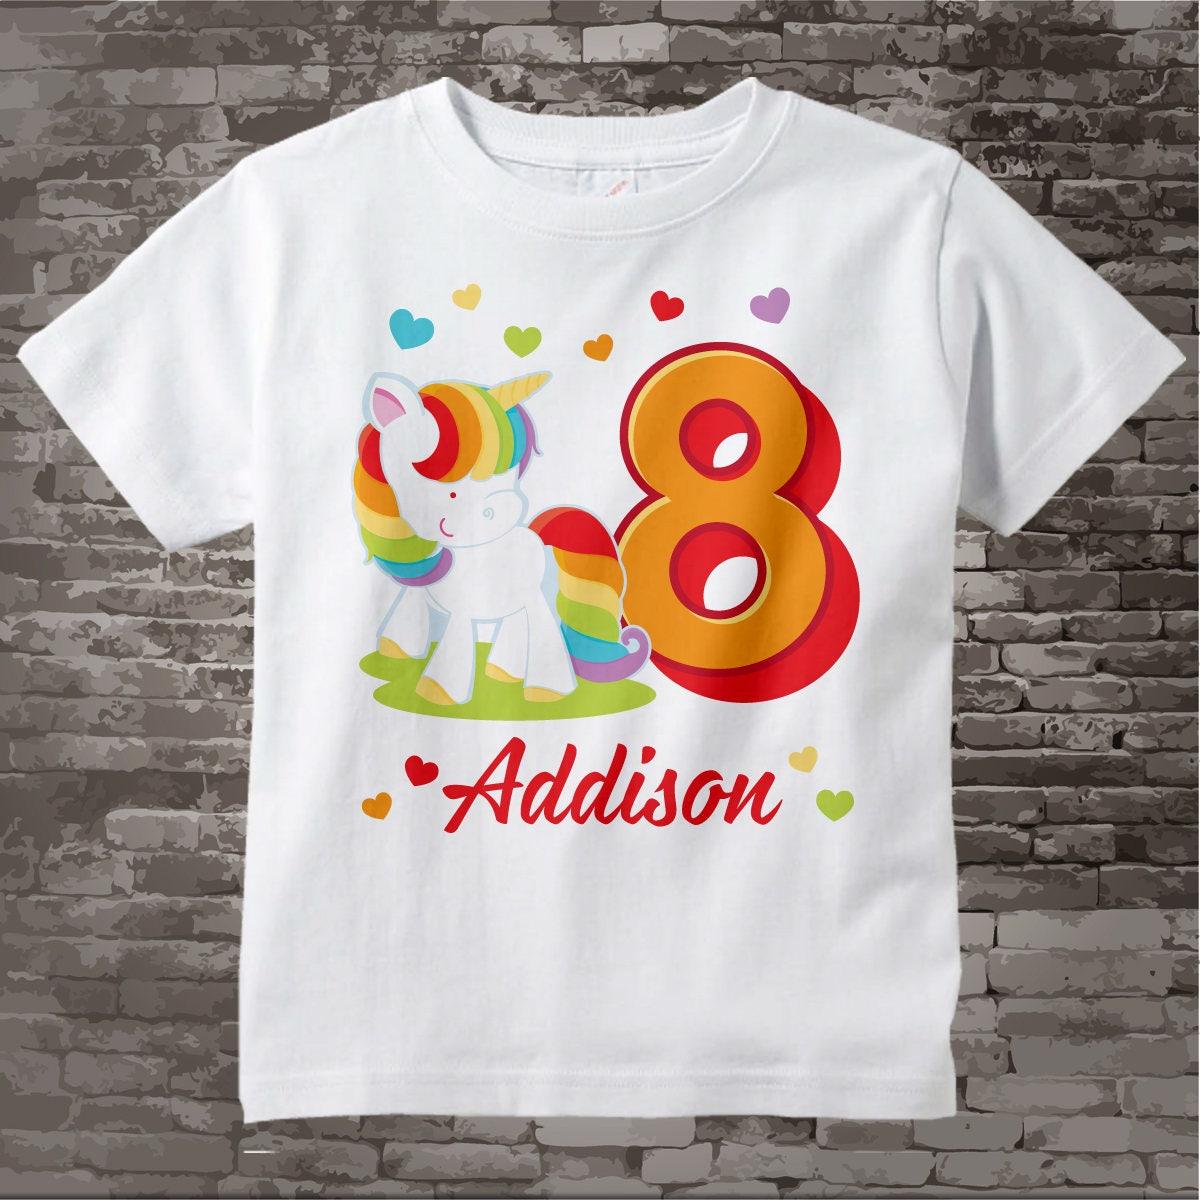 Personalized Girls Eighth Birthday Shirt Rainbow Unicorn Theme 03272017a Gallery Photo